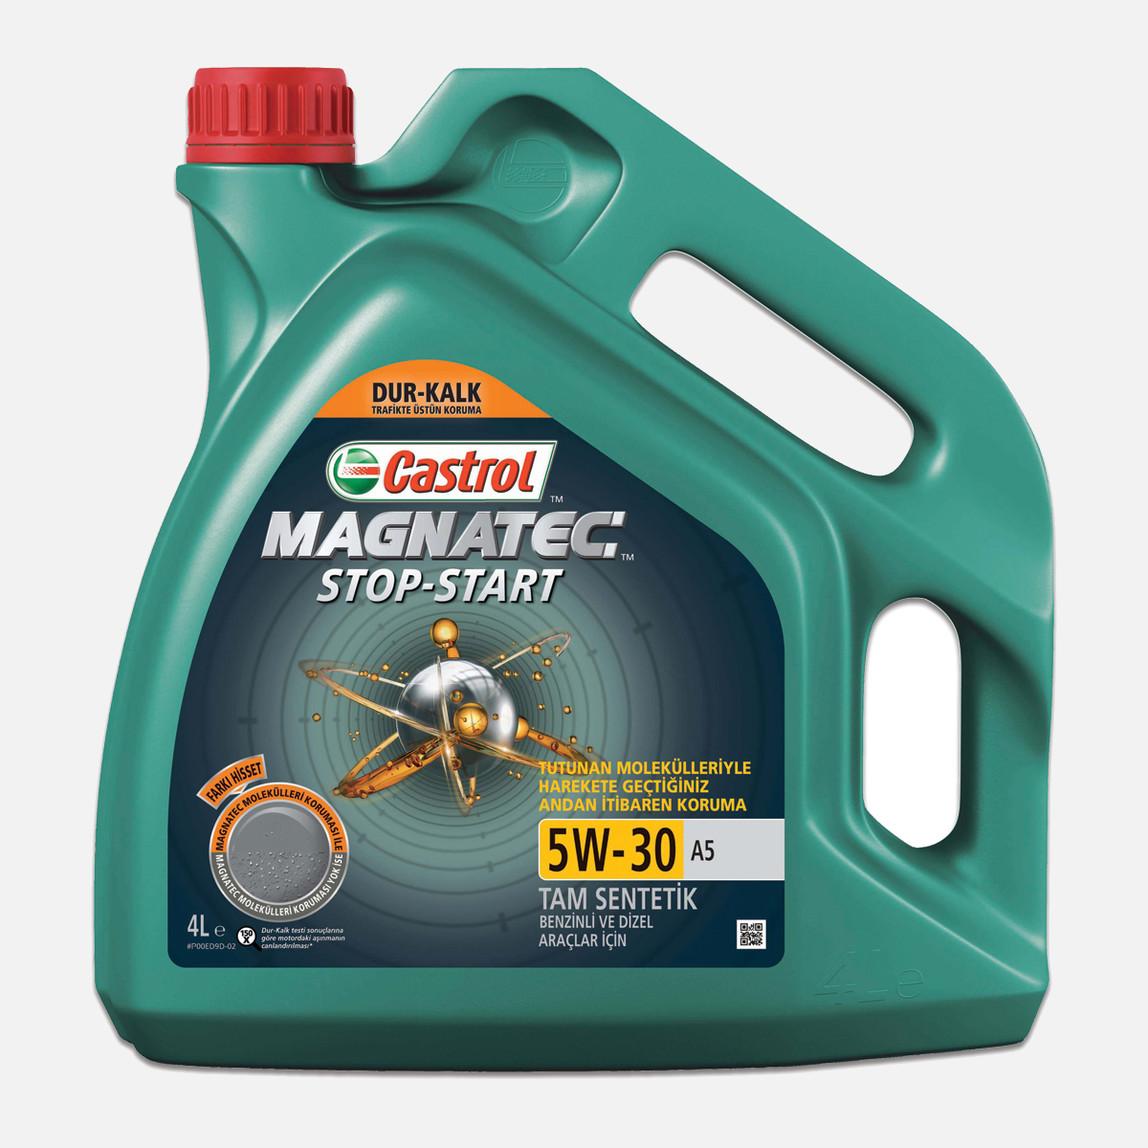 Magnatec Stop-Start 5w-30 A5 4 Litre Motor Yağı